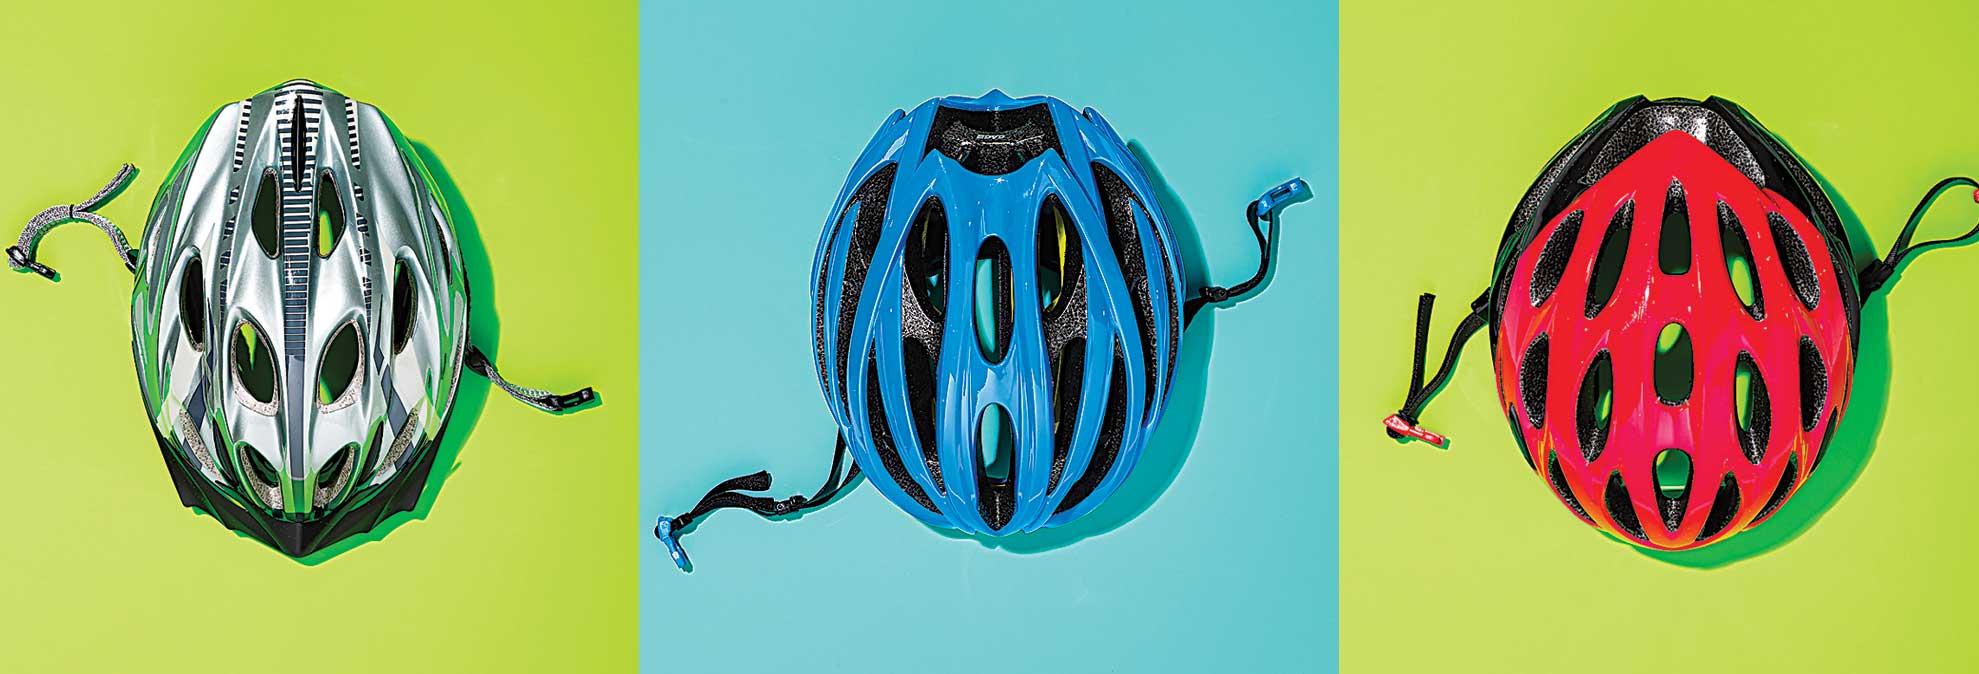 e1feb37342a Find the Best Bike Helmet - Consumer Reports